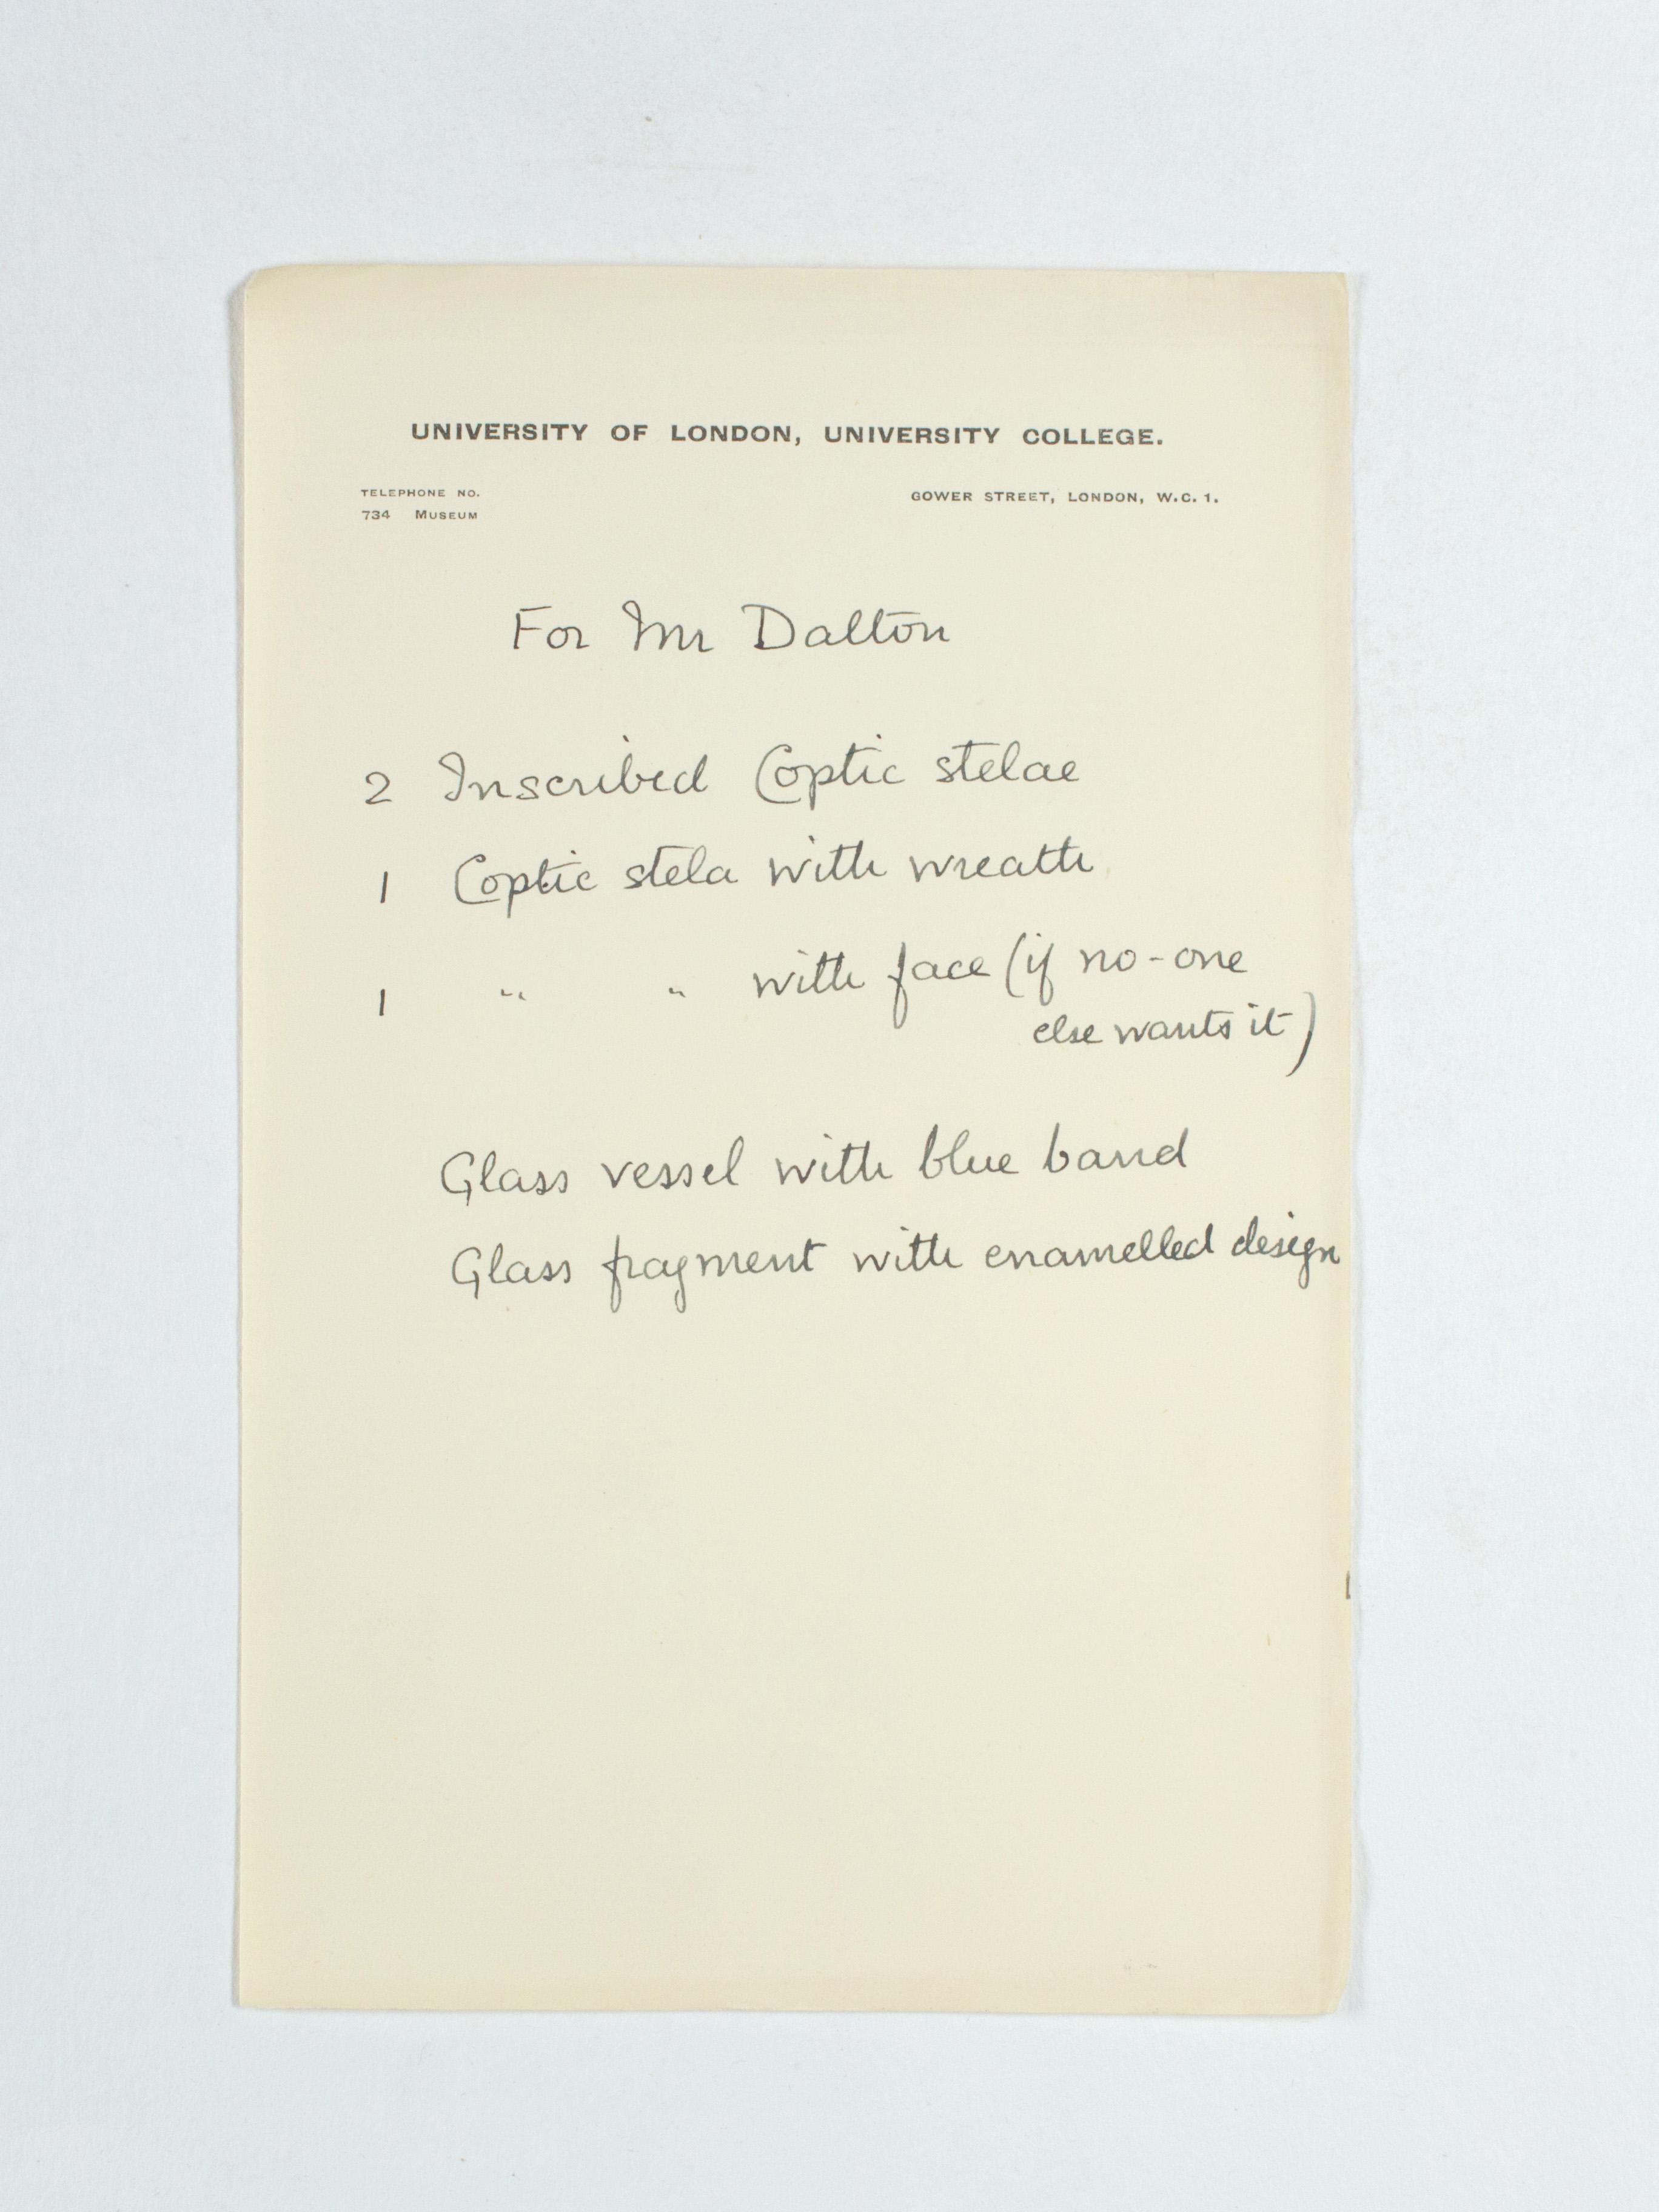 1924-25 Badari, Faiyum Correspondence PMA/WFP1/D/28/30.2